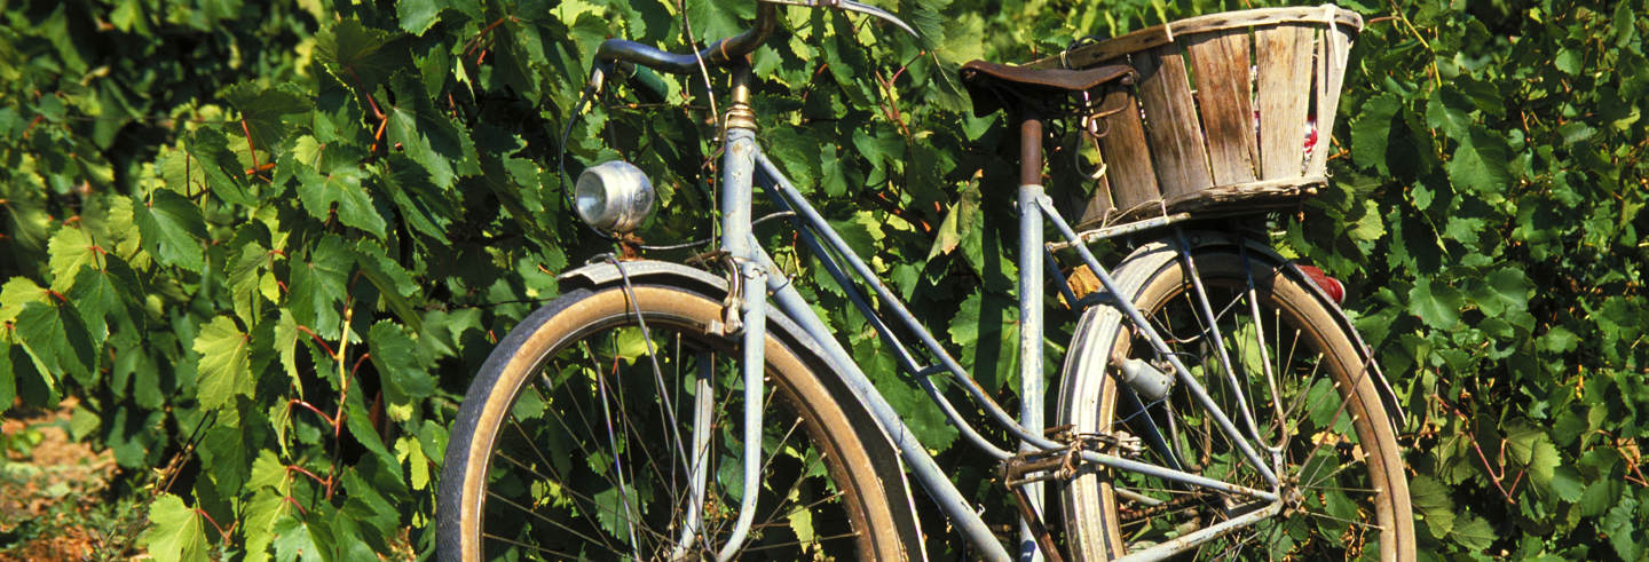 Alquiler de bicicleta en Maipú